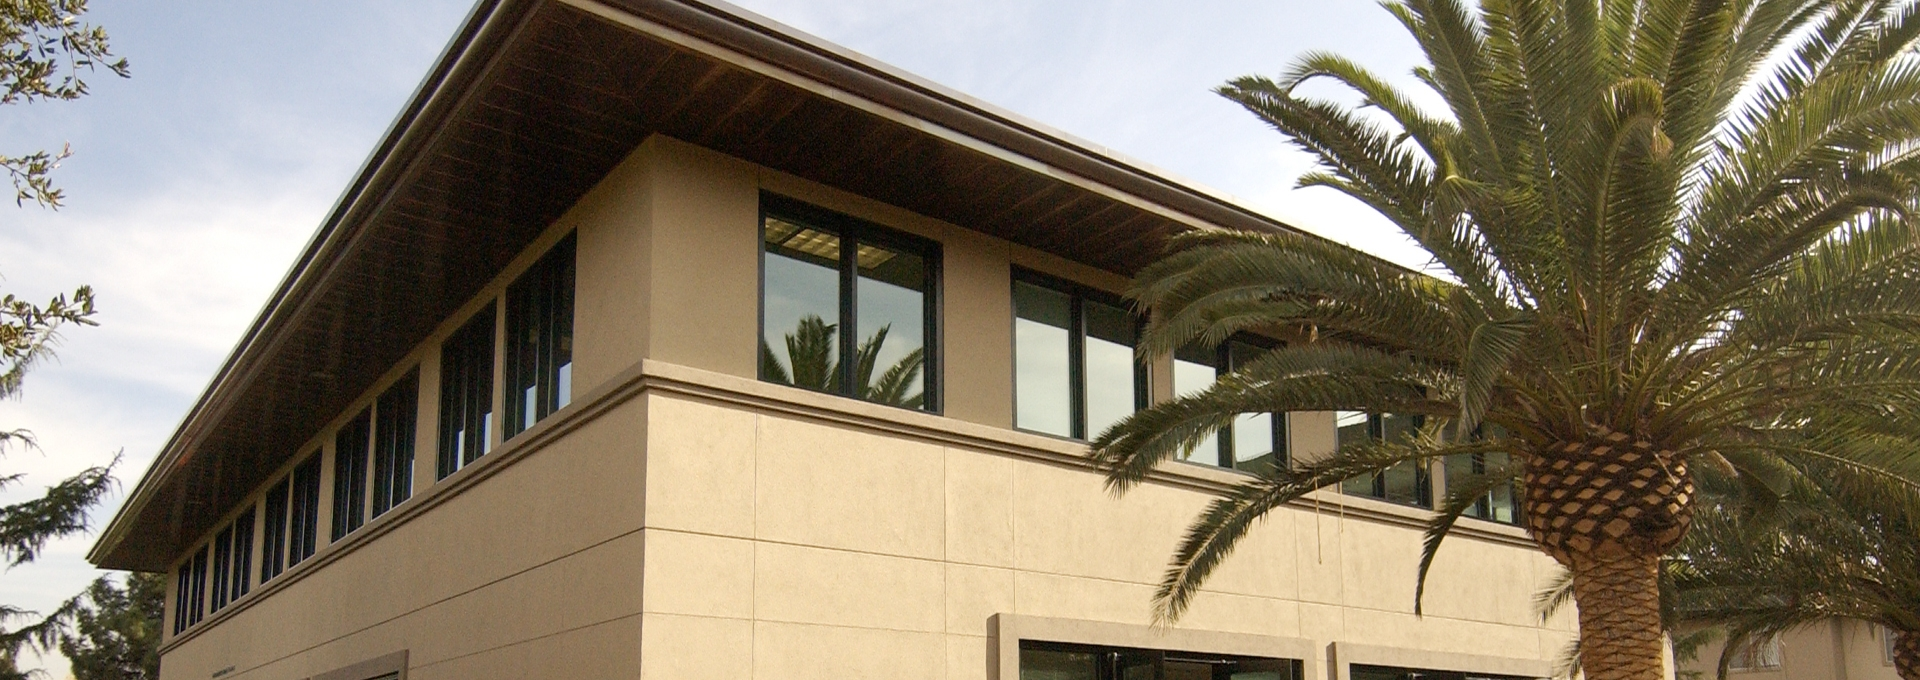 Graduate Community Center